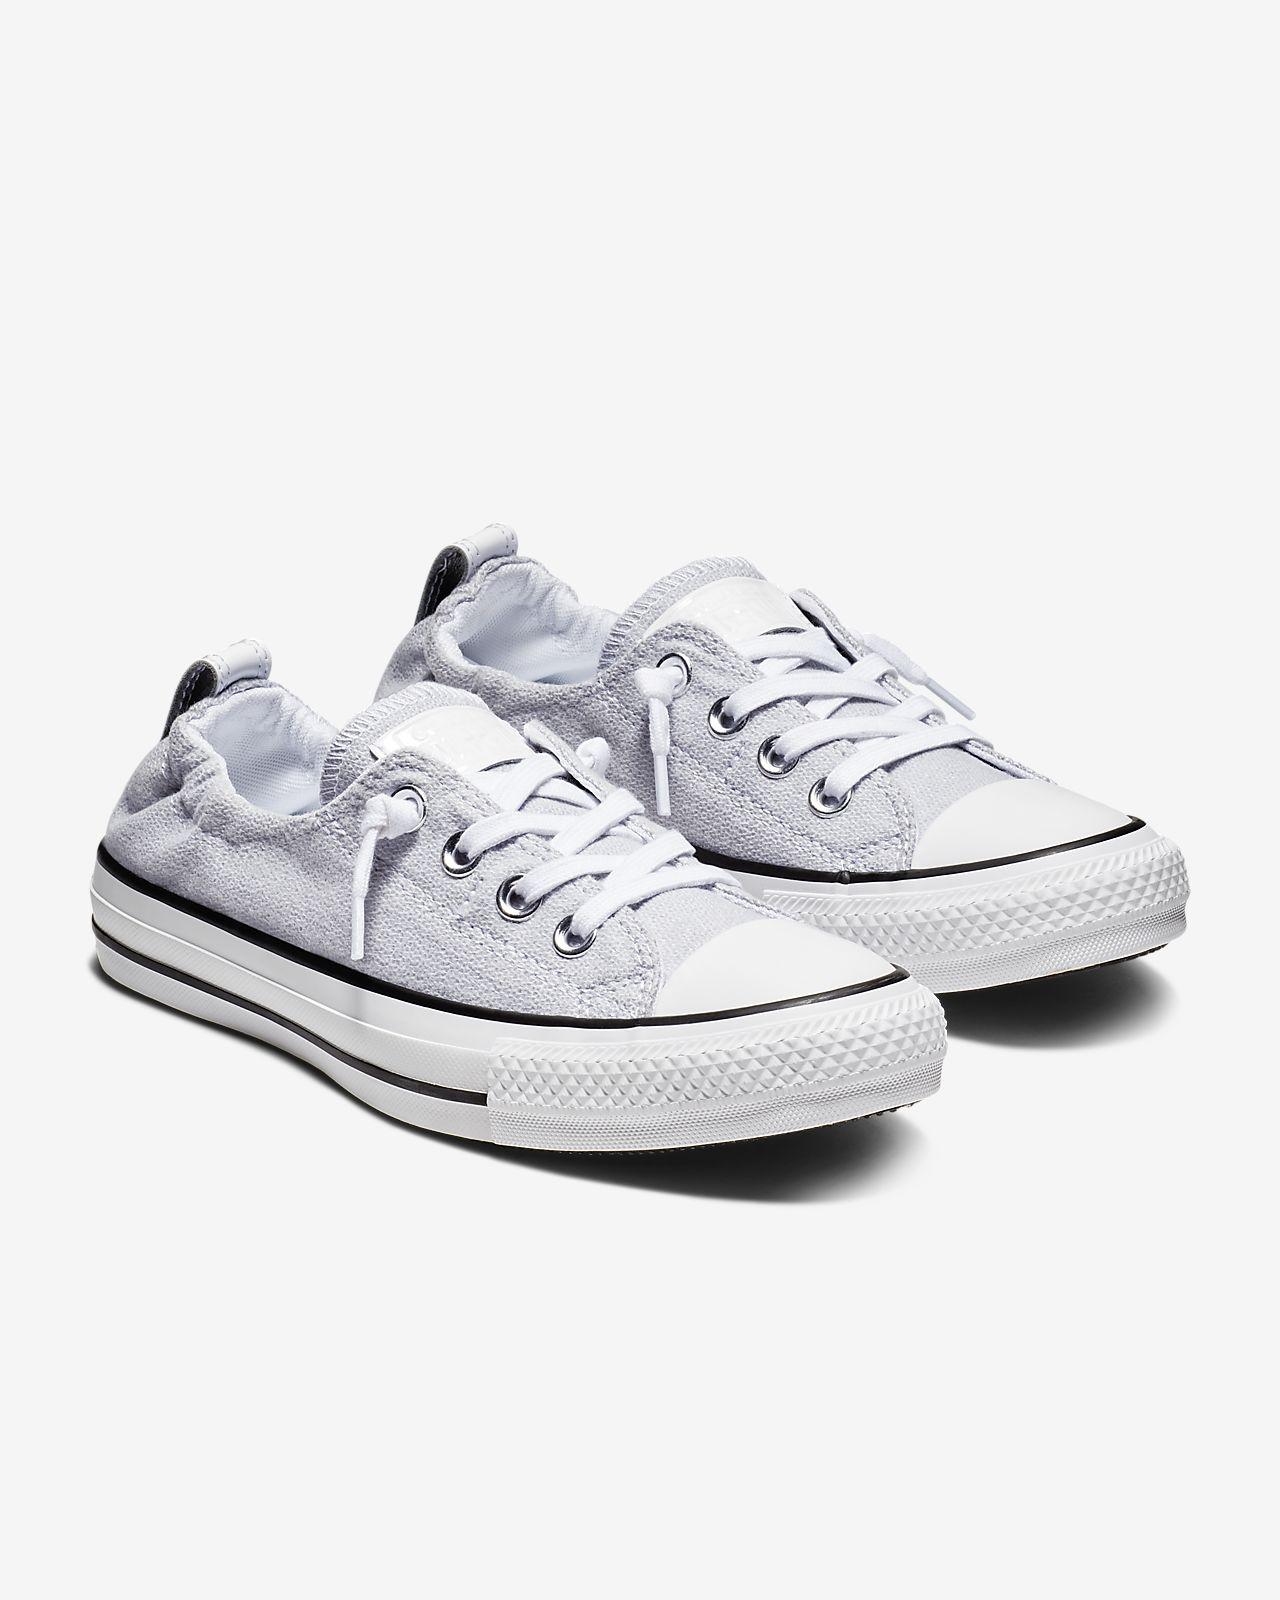 Converse Chuck Taylor All Star Shoreline Slip Women's Shoe